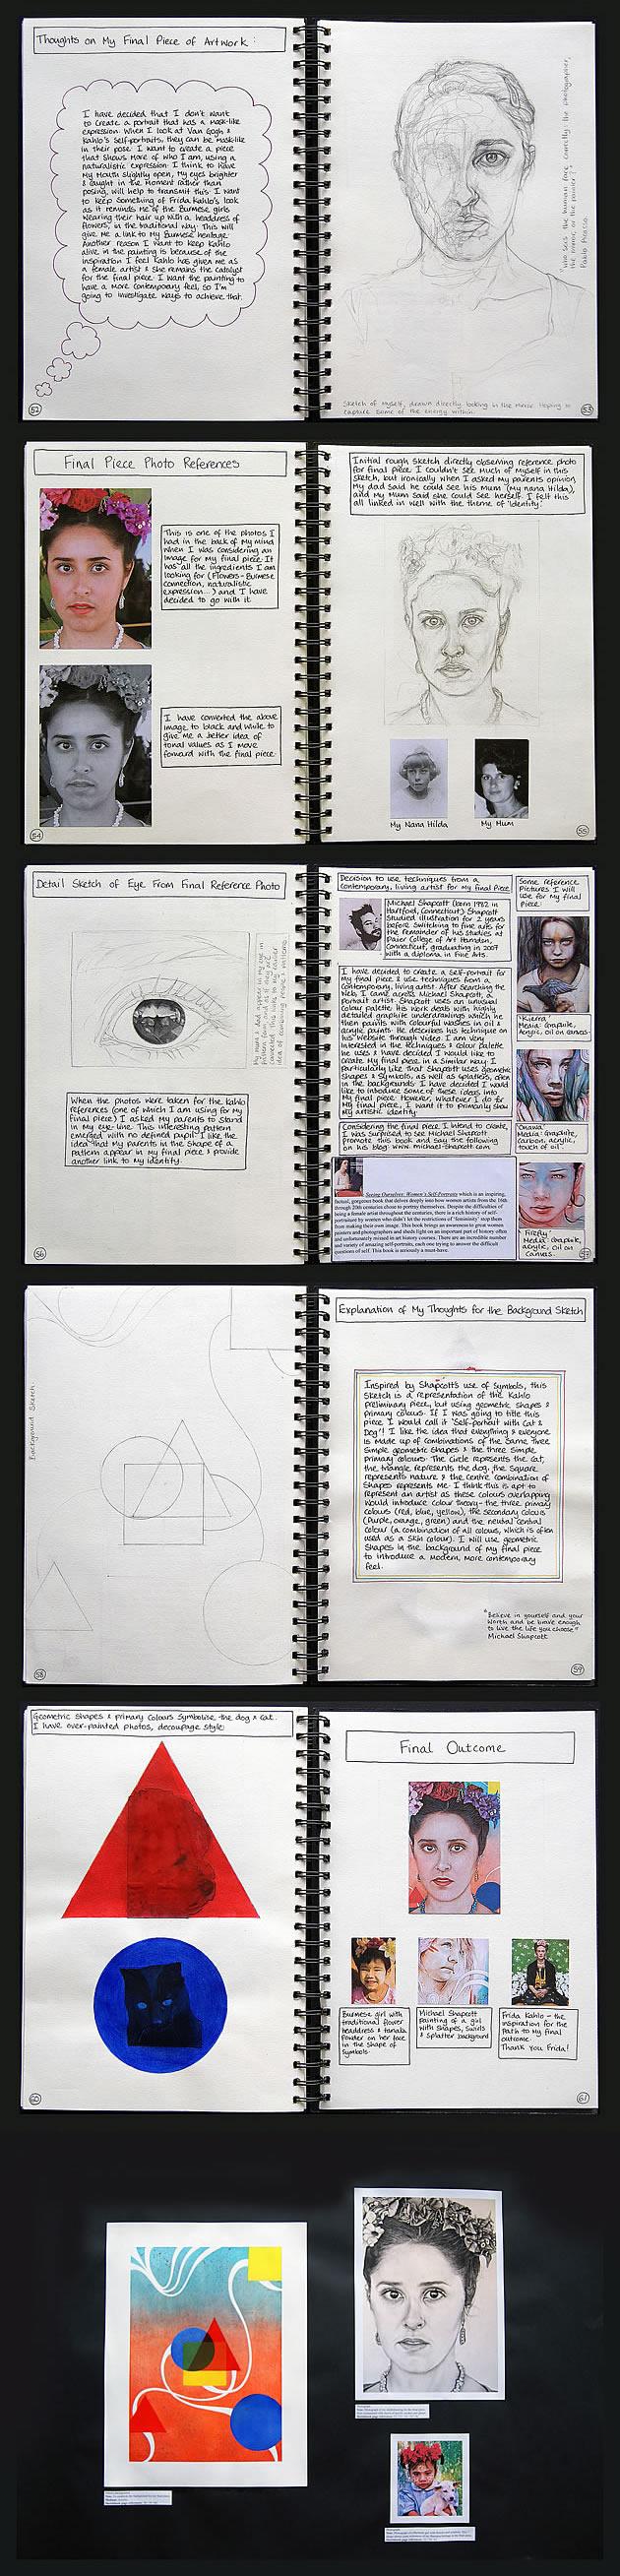 development of self-portrait ideas